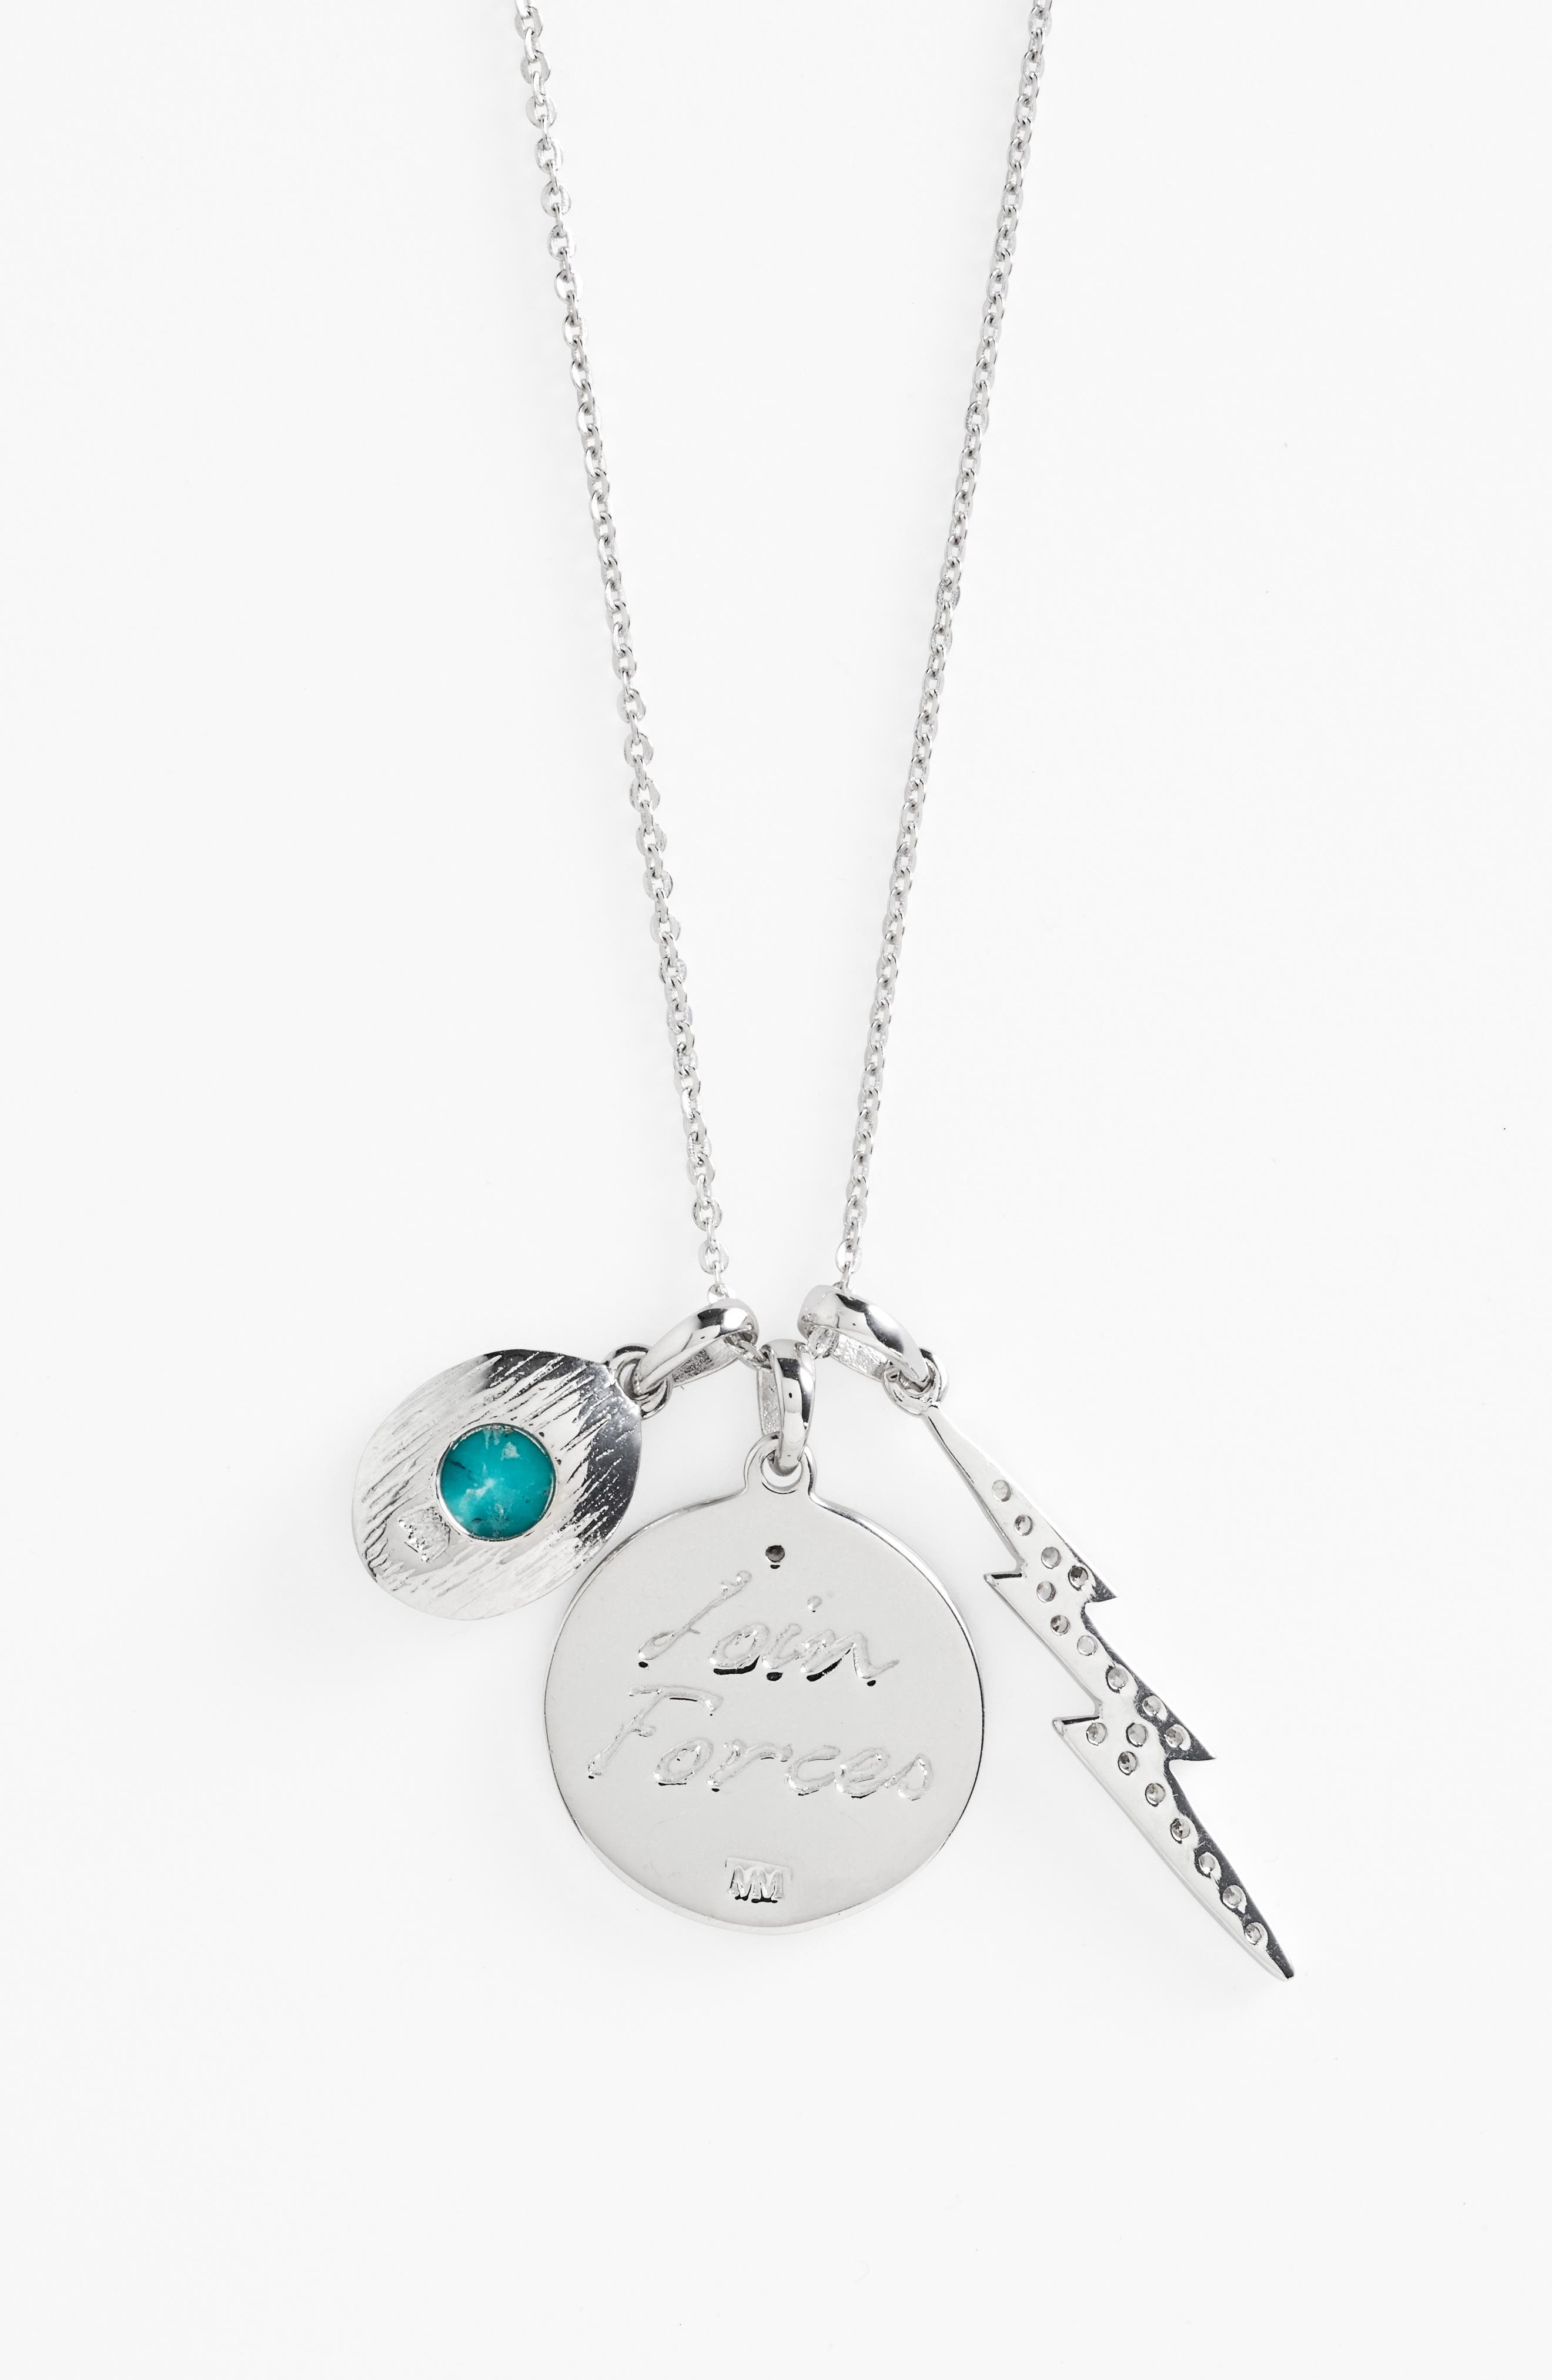 Goddess of Sisterhood Pendant Necklace,                             Alternate thumbnail 2, color,                             040